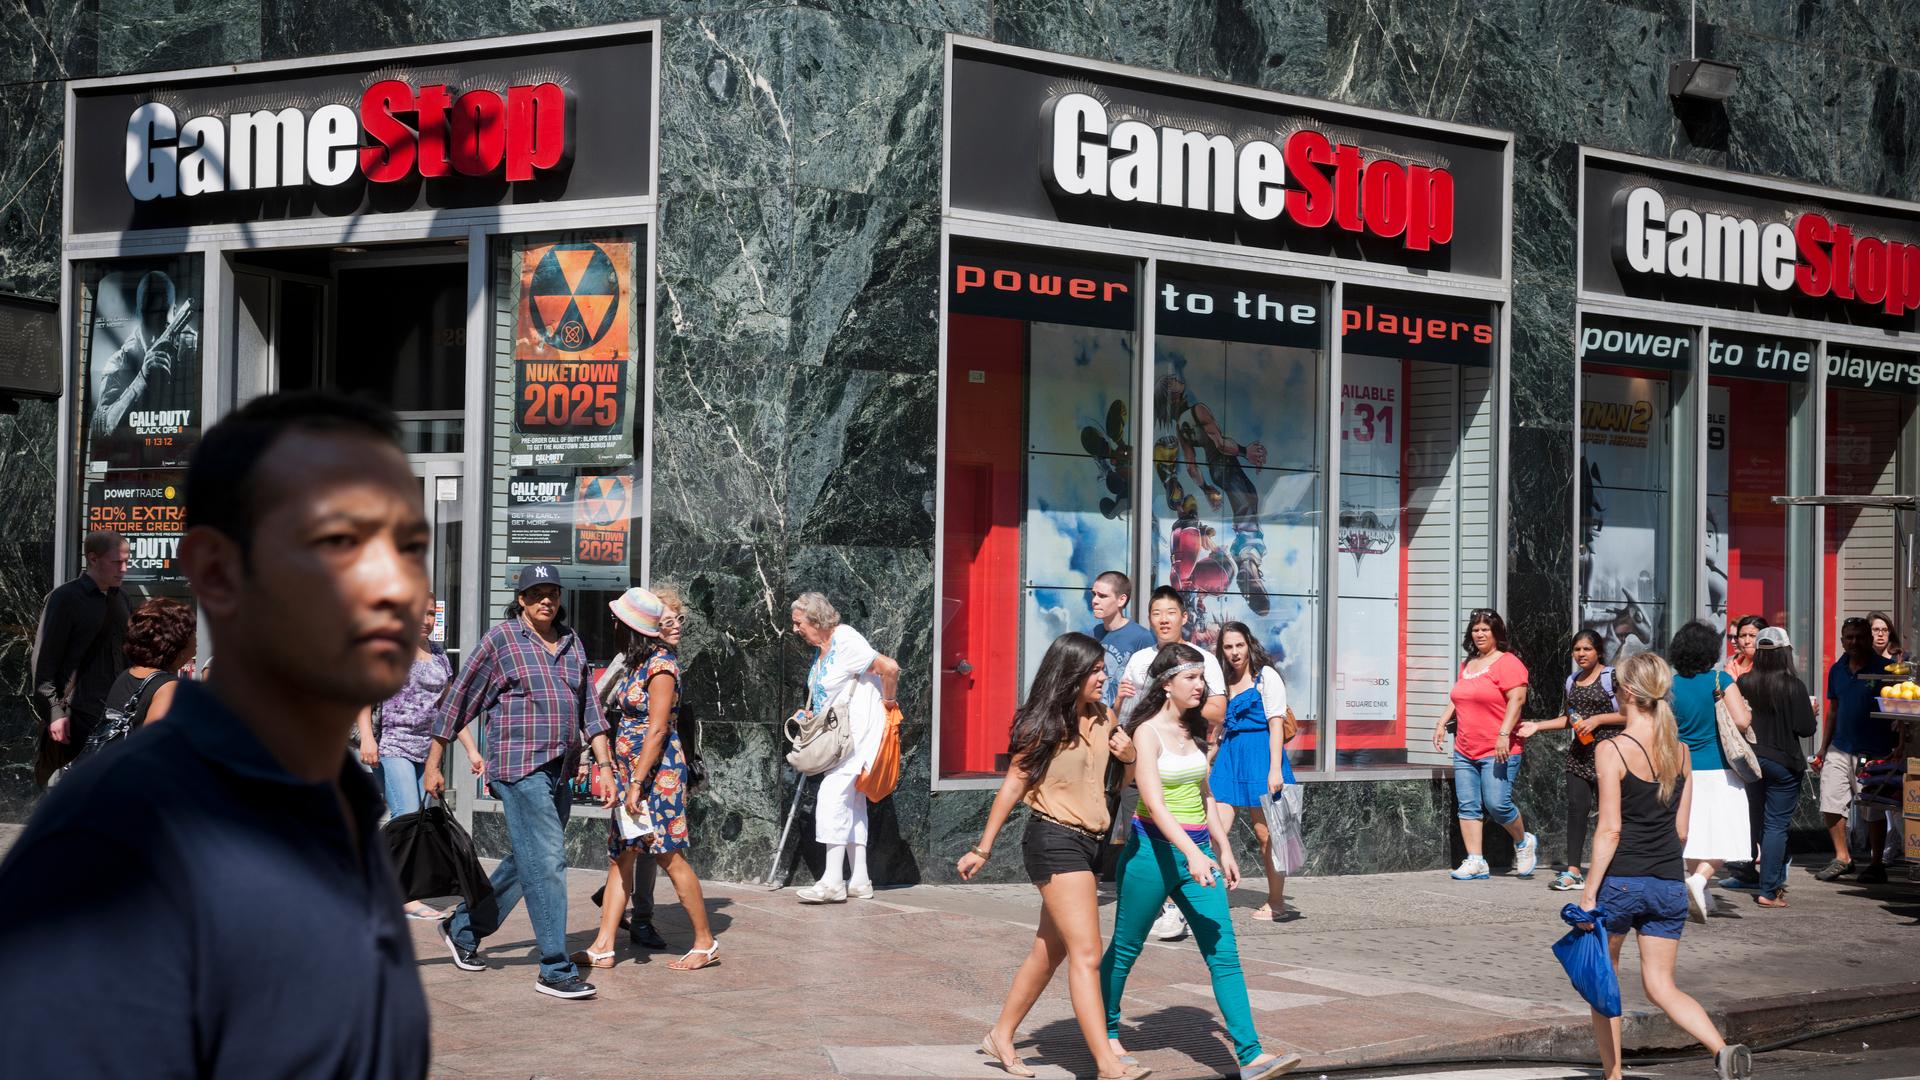 GameStop in store with people walking